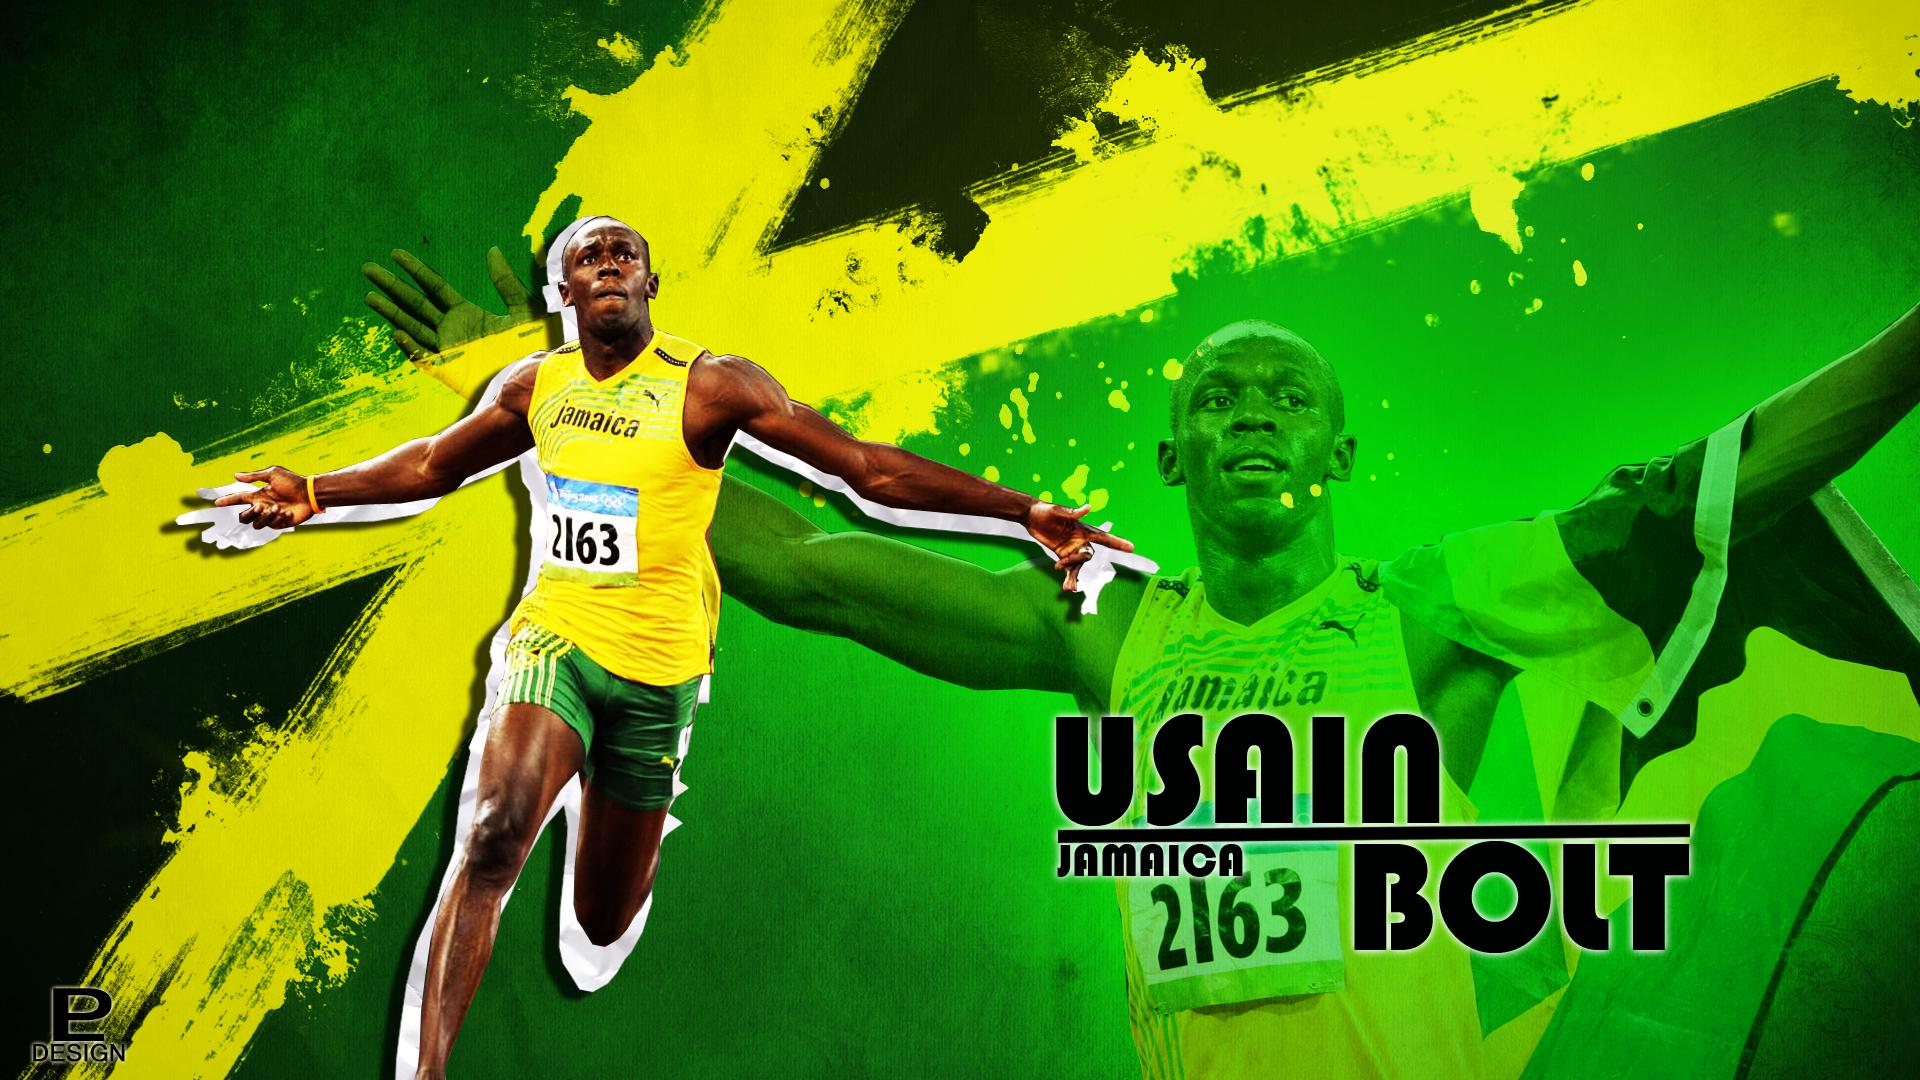 Usain Bolt by PAulie SVK 1920 x 1080 1920x1080